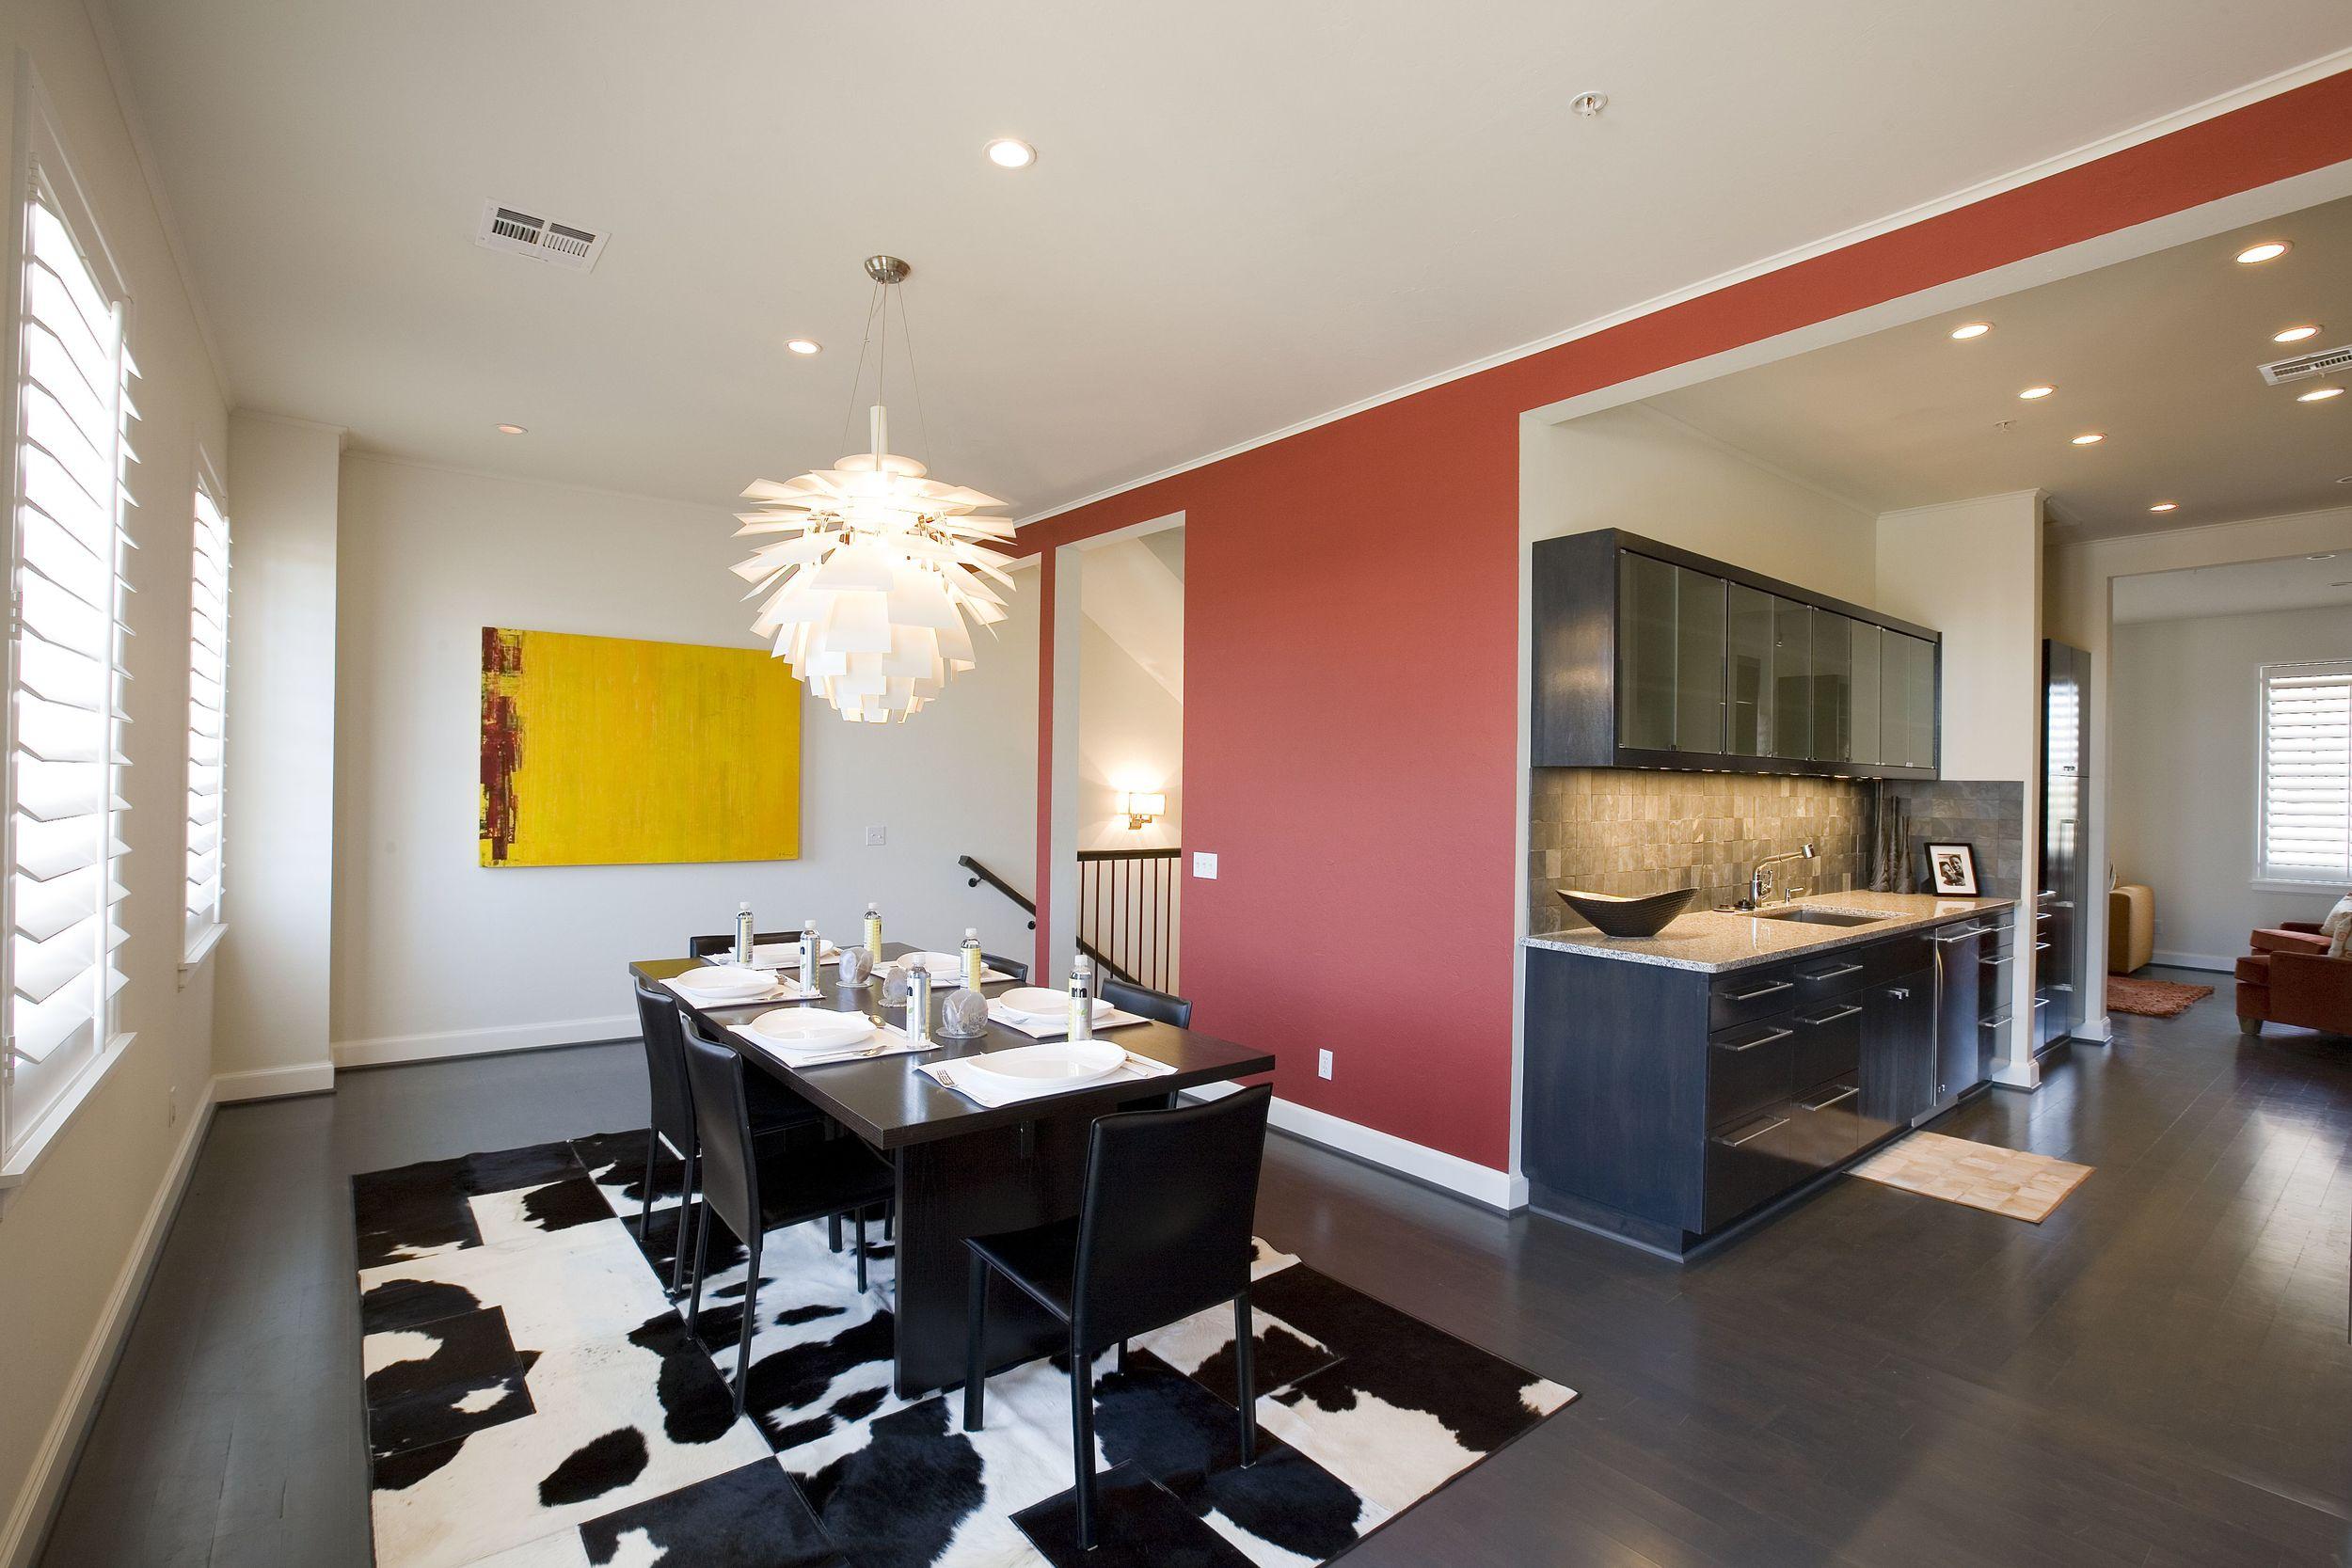 _MG_8644maywood breakfast room:kitchen.jpg